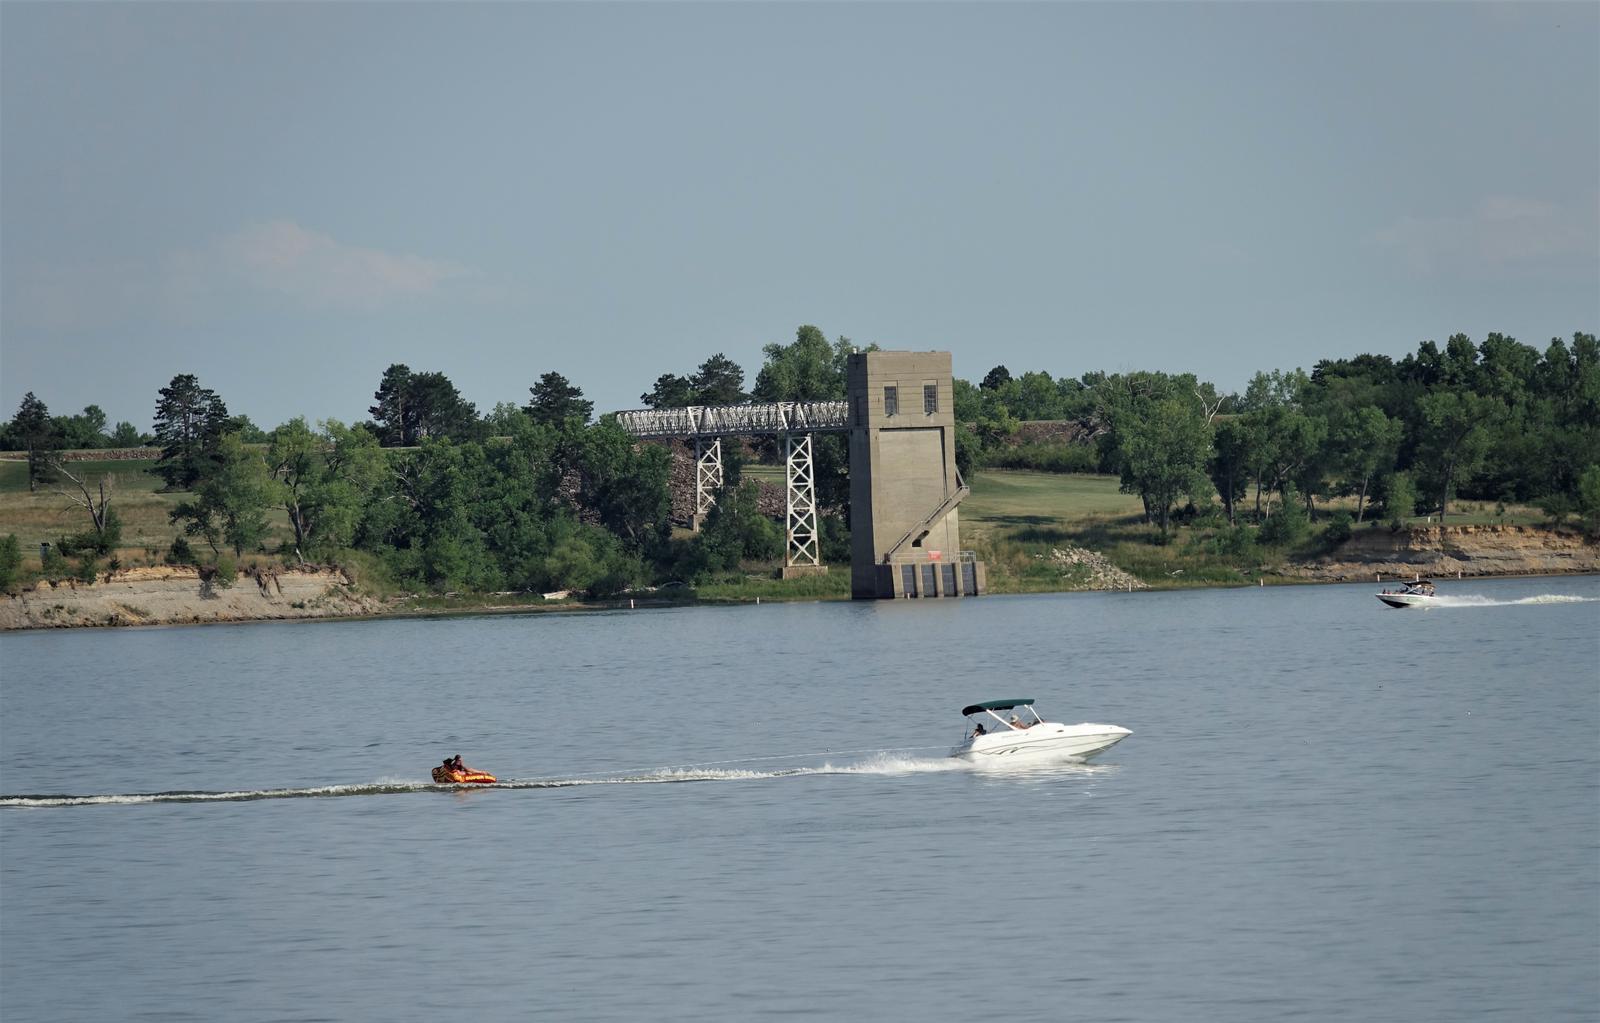 Kanopolis Lake BoatingControl Tower behind boating.